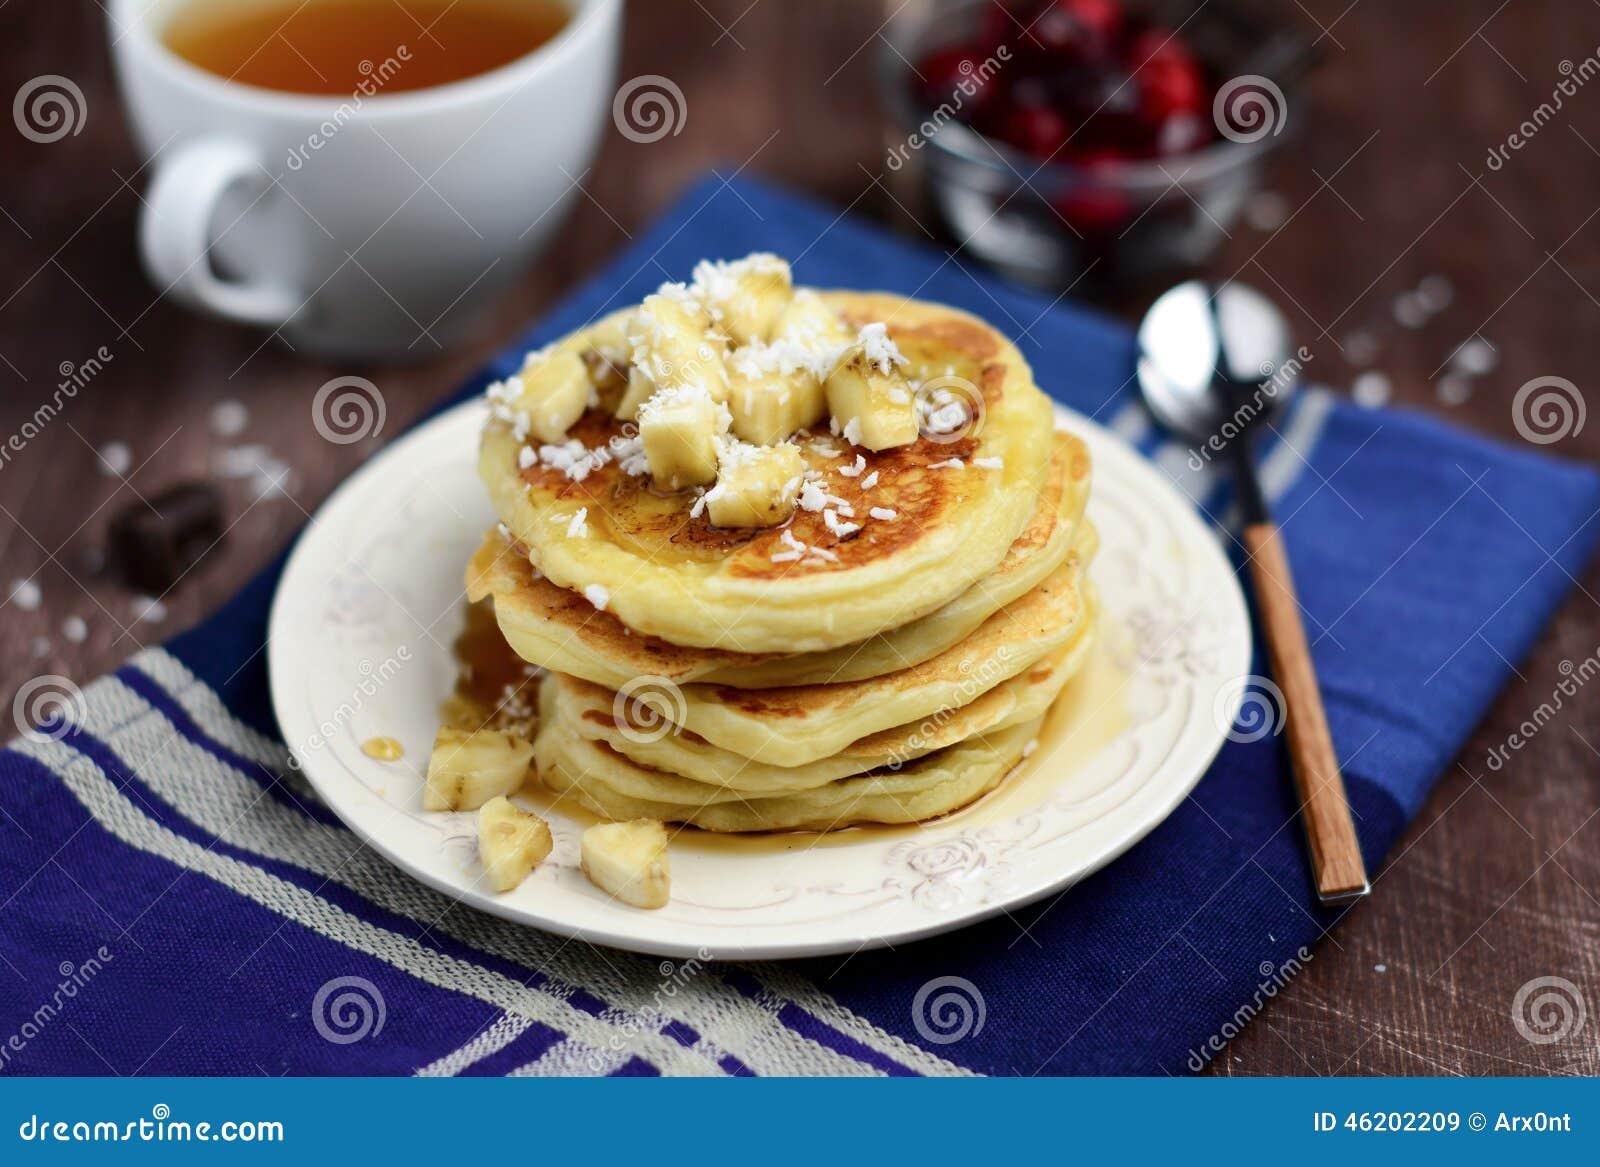 Watch Blueberry-Ricotta Pancakes video